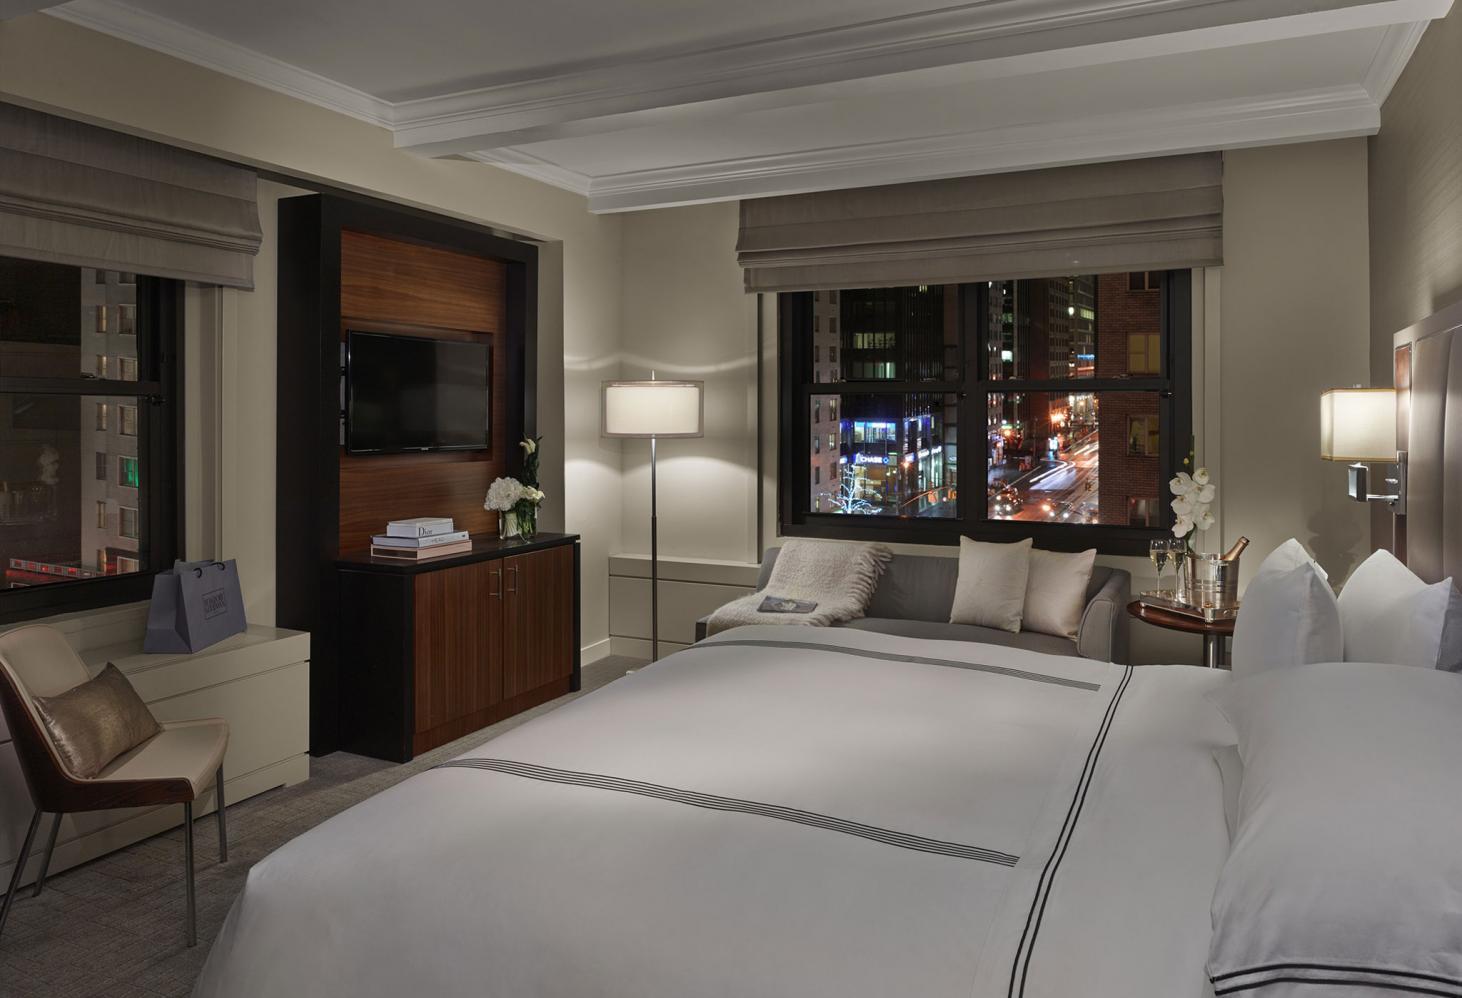 США. Нью Йорк. The Quin Hotel, New York